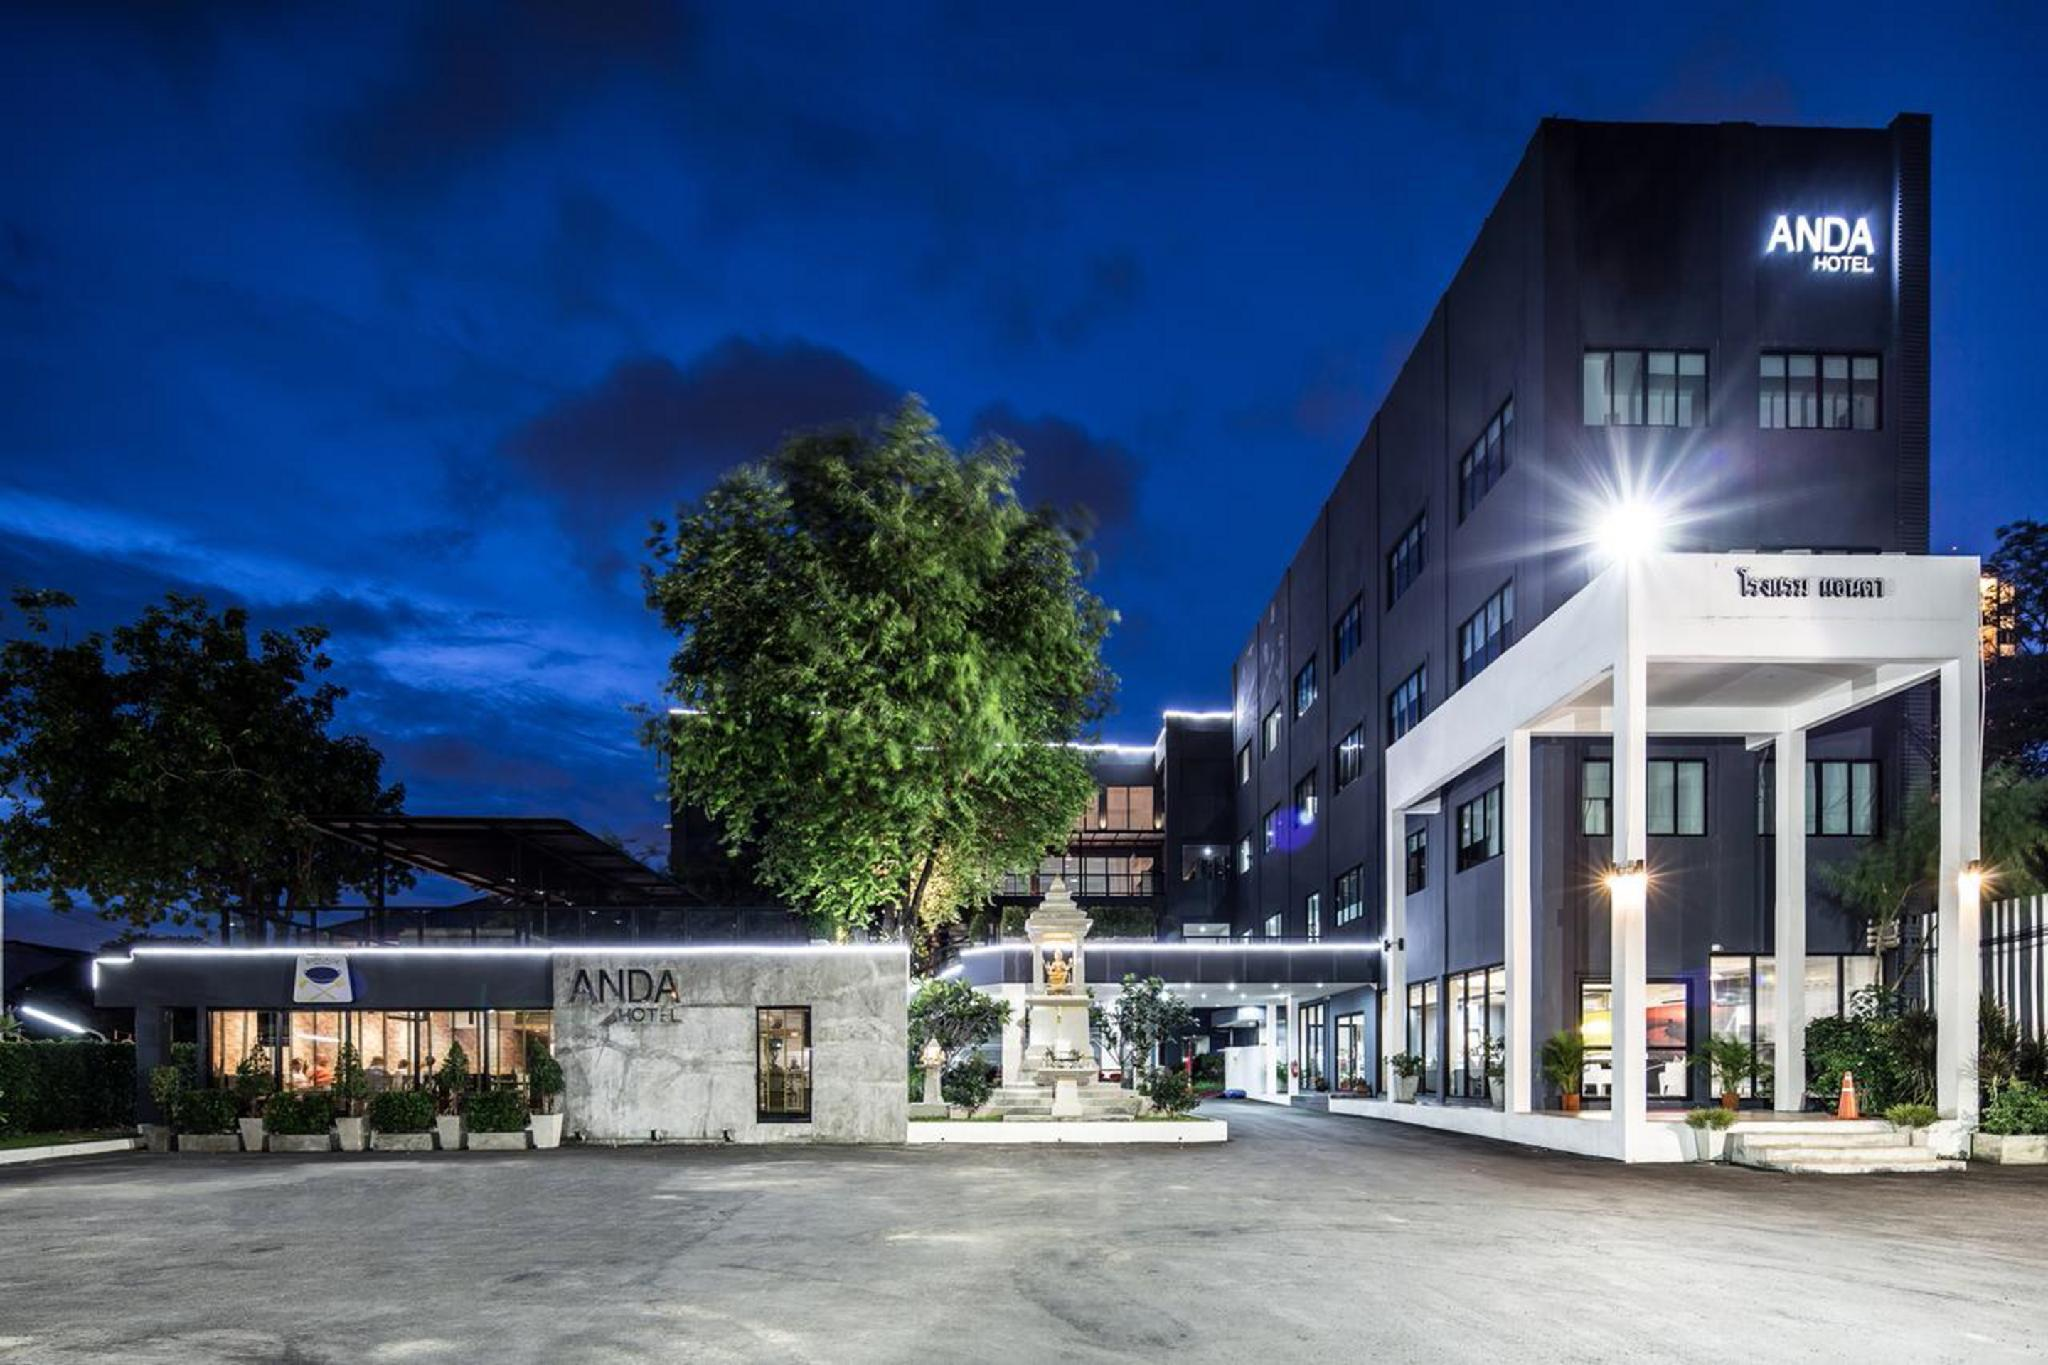 OYO 545 Anda Hotel Bangkok โอโย 545 อันดา โฮเต็ล แบงค็อก